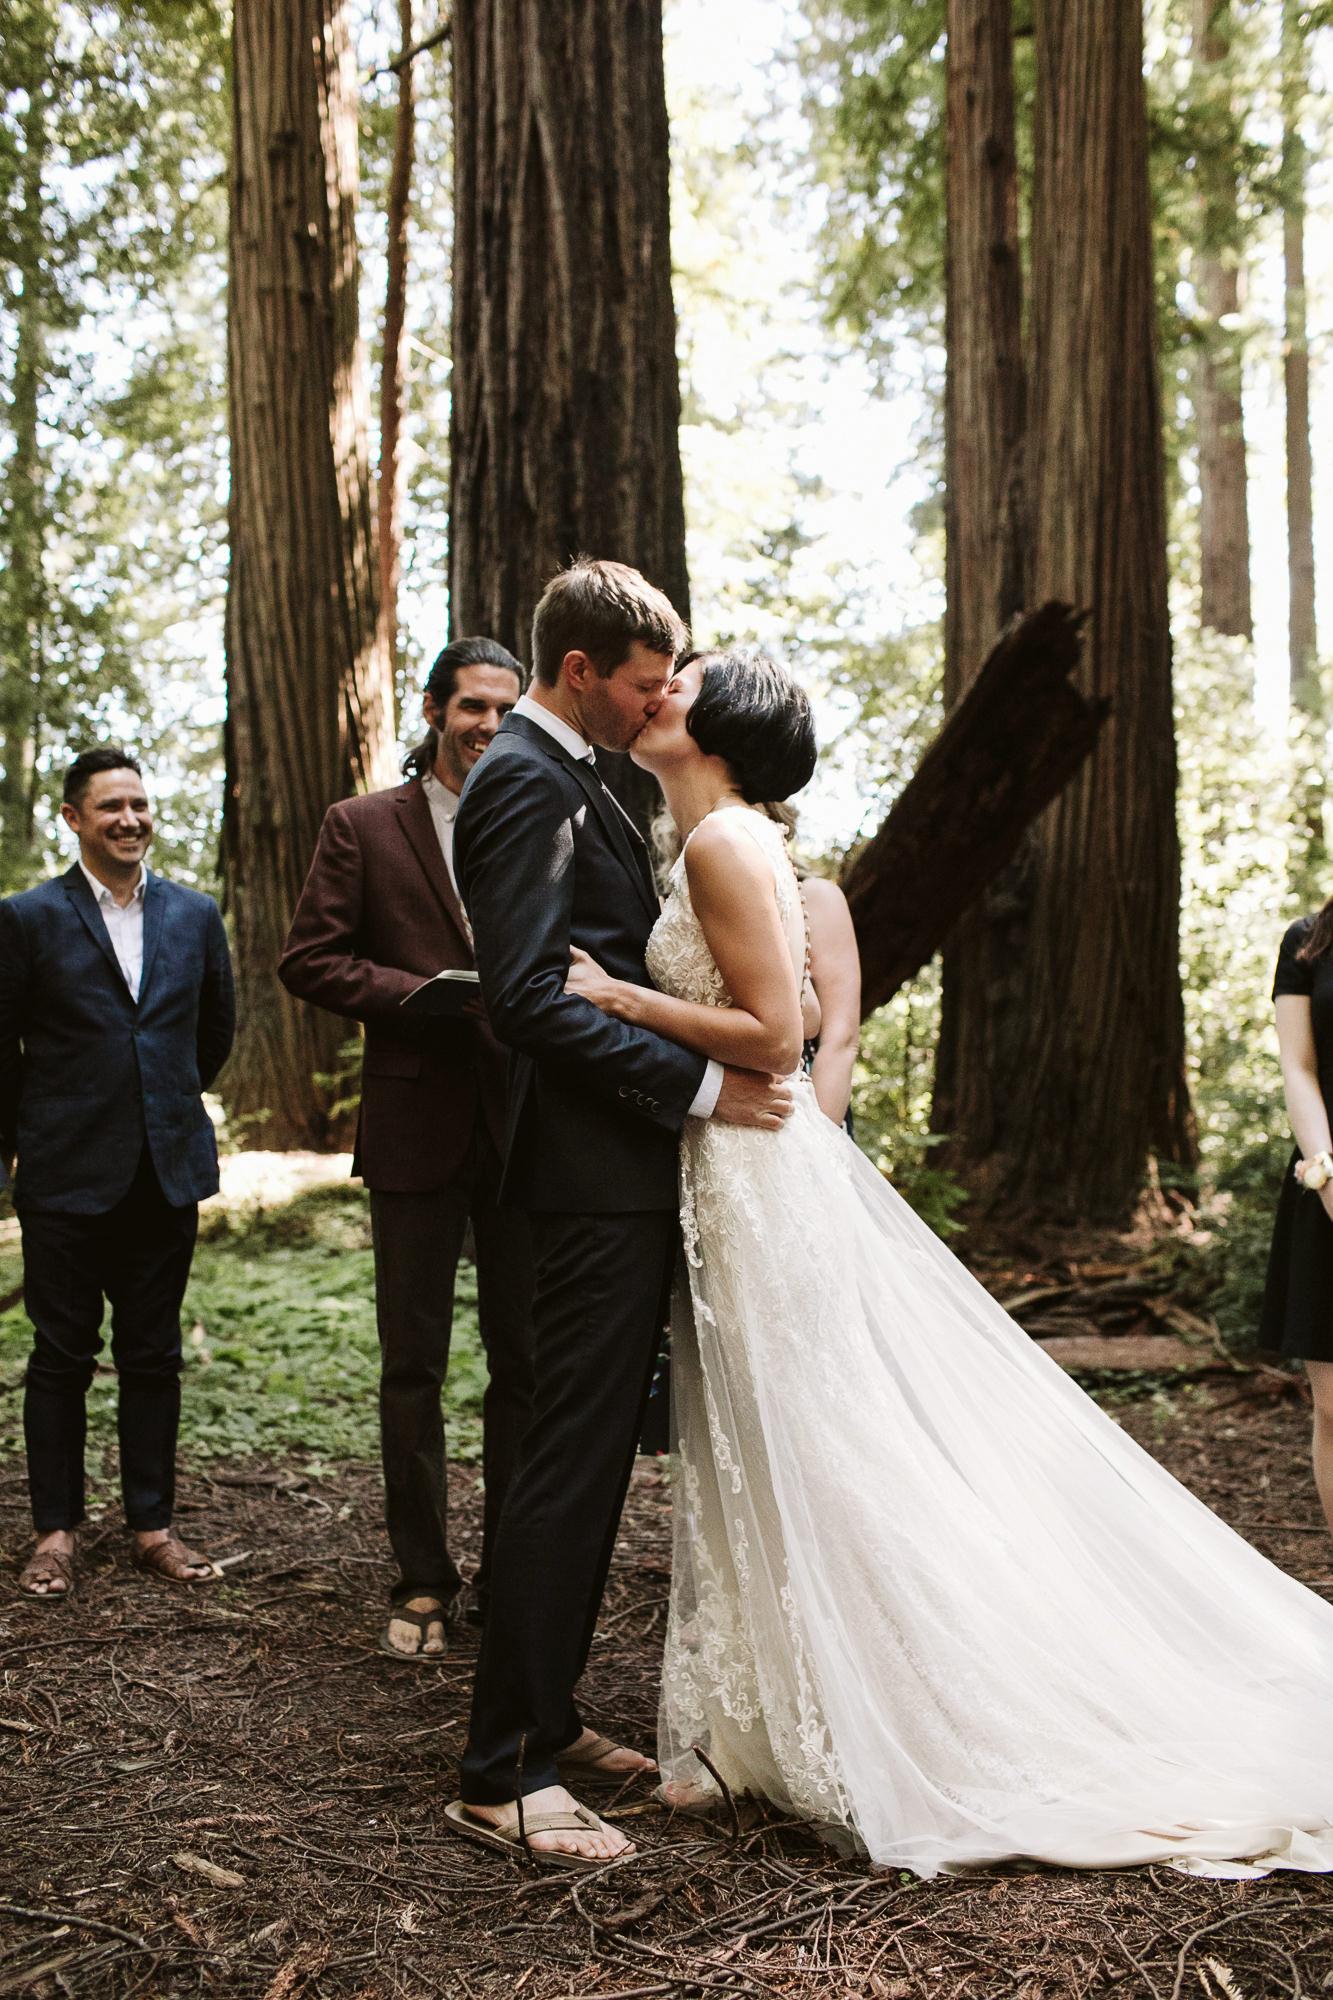 California-wedding-photographer-alfonso-flores-pamplin-groove-207.jpg